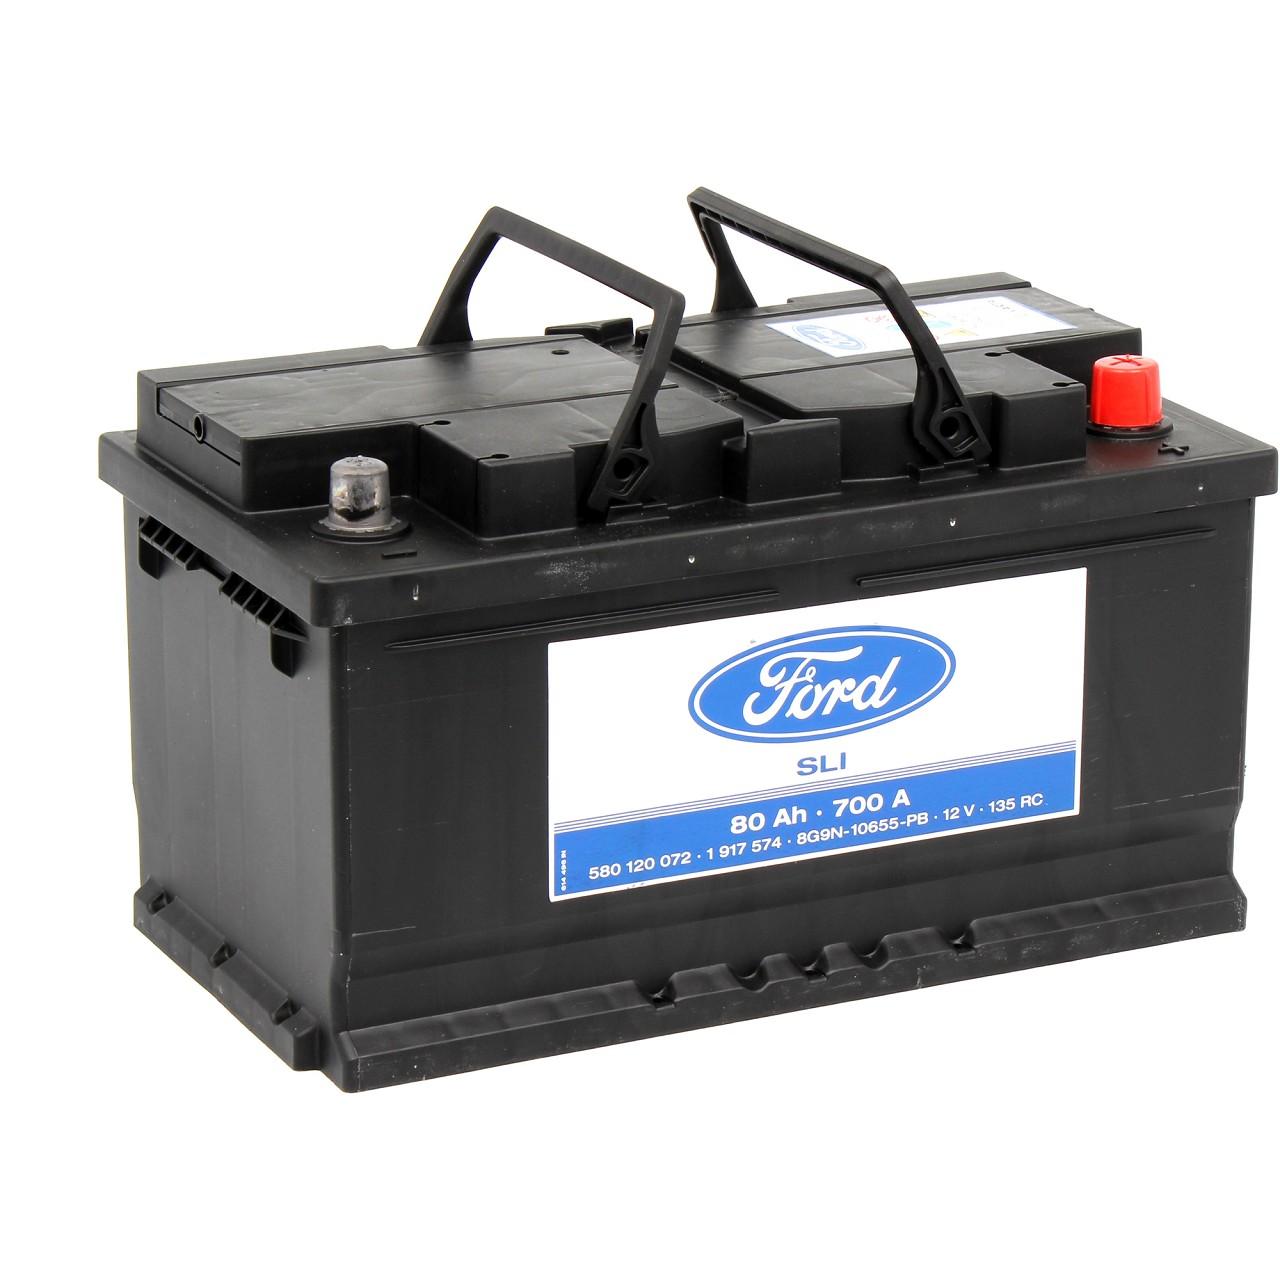 ORIGINAL Ford Autobatterie Batterie Starterbatterie 12V 80Ah 700A 1917574